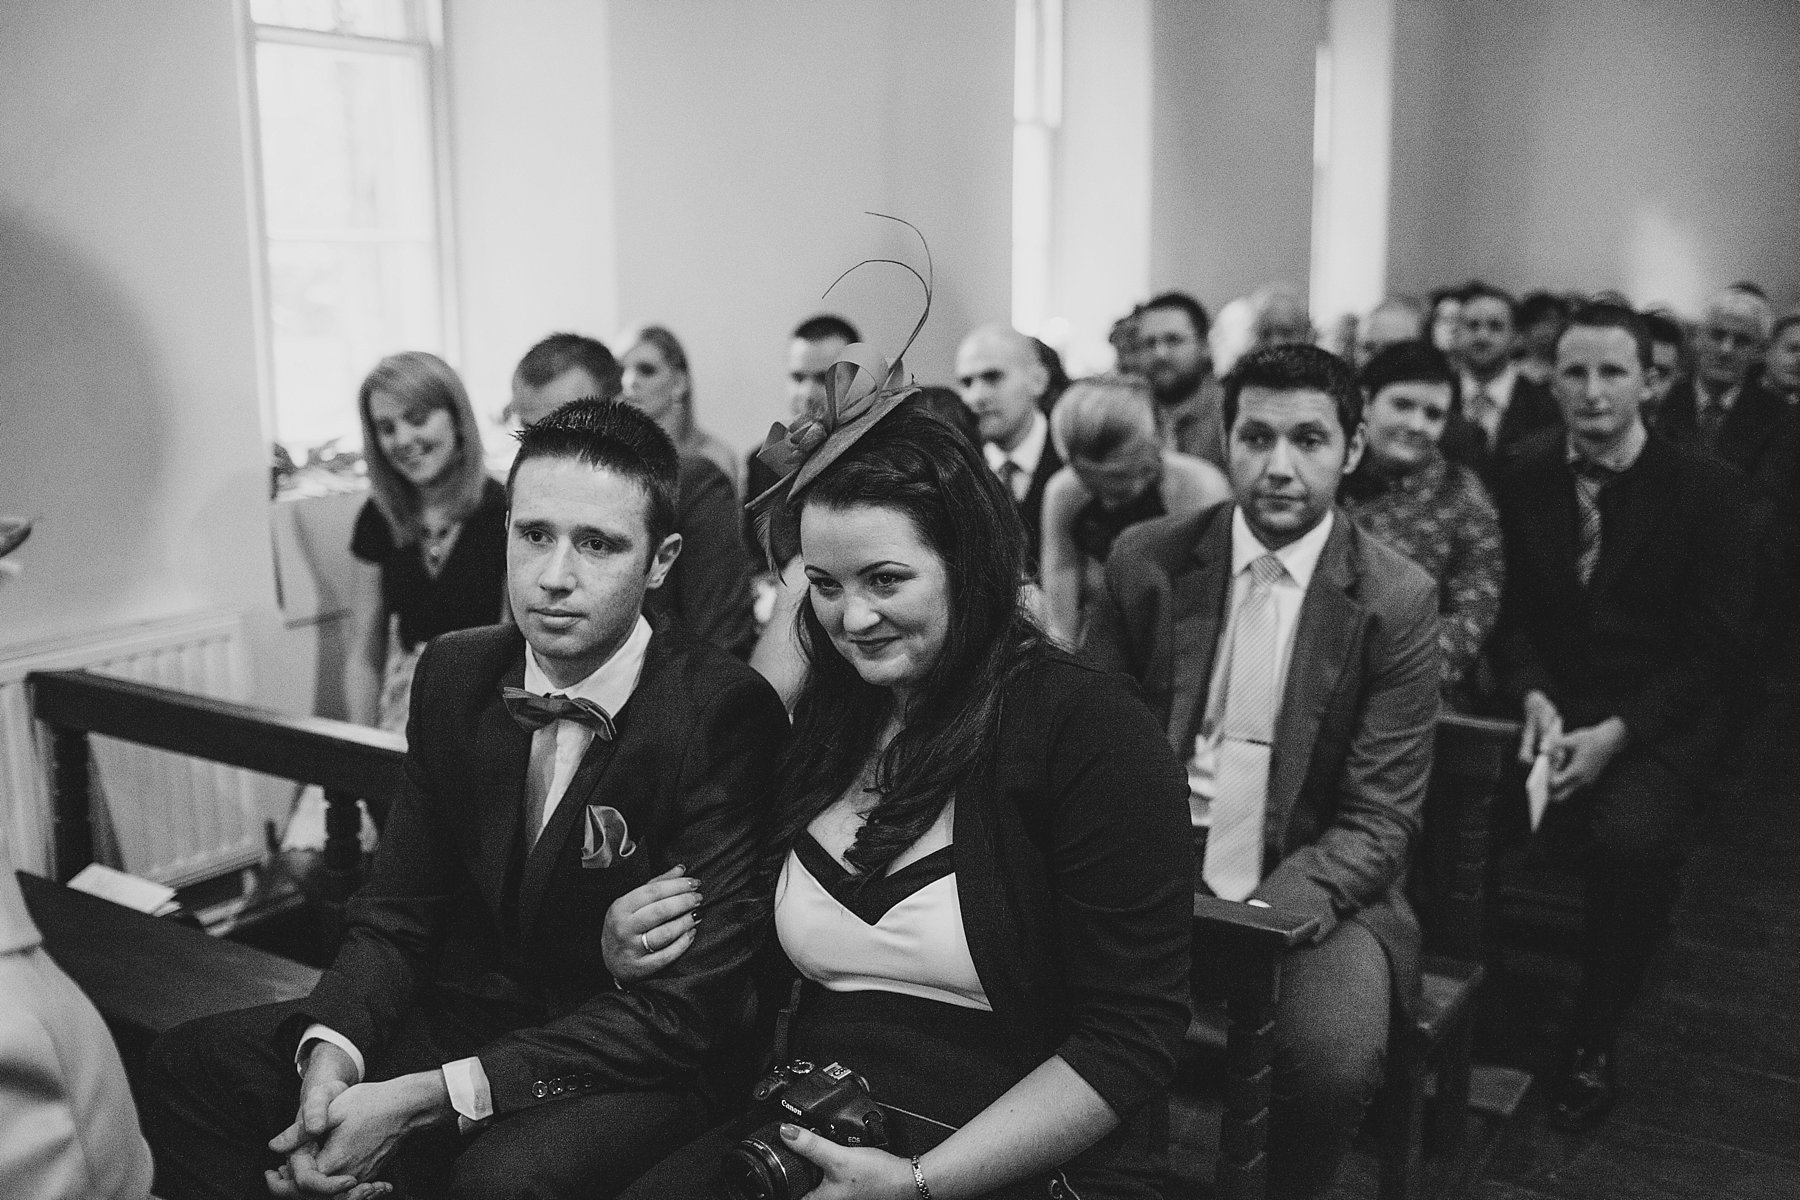 brooklodge_ireland_wicklow_weddings_0022